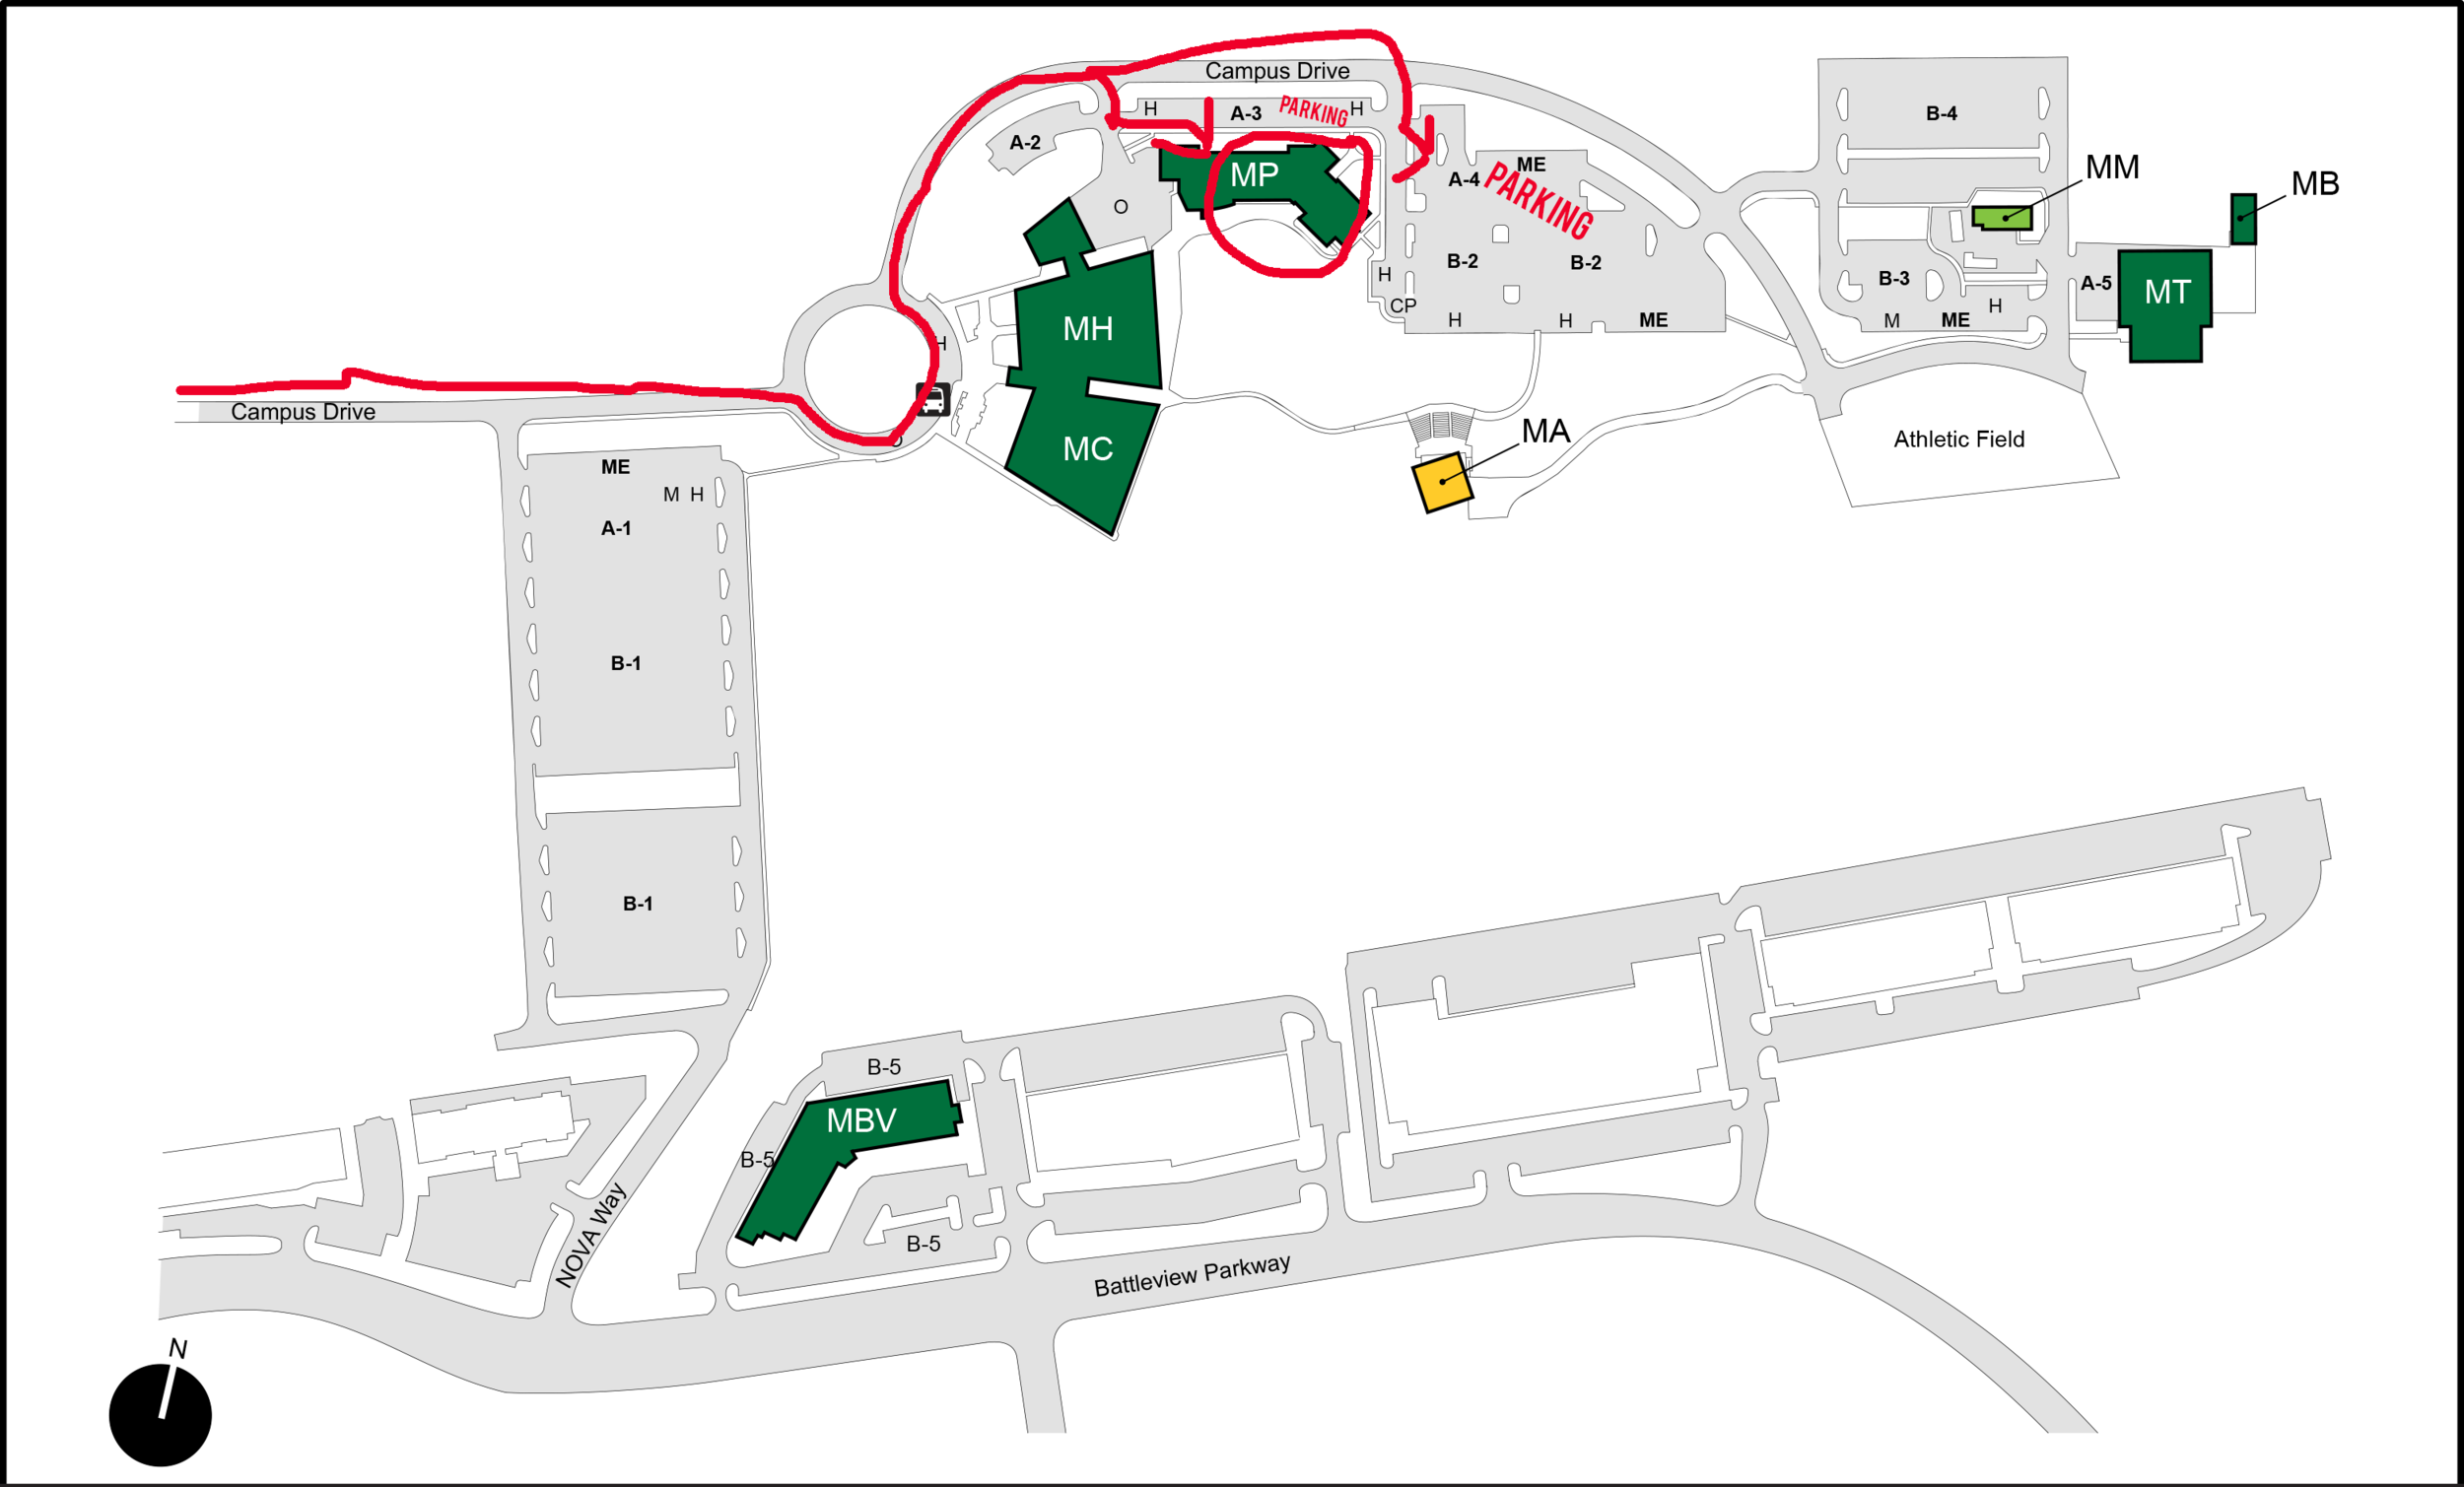 manassas-campus-map.png